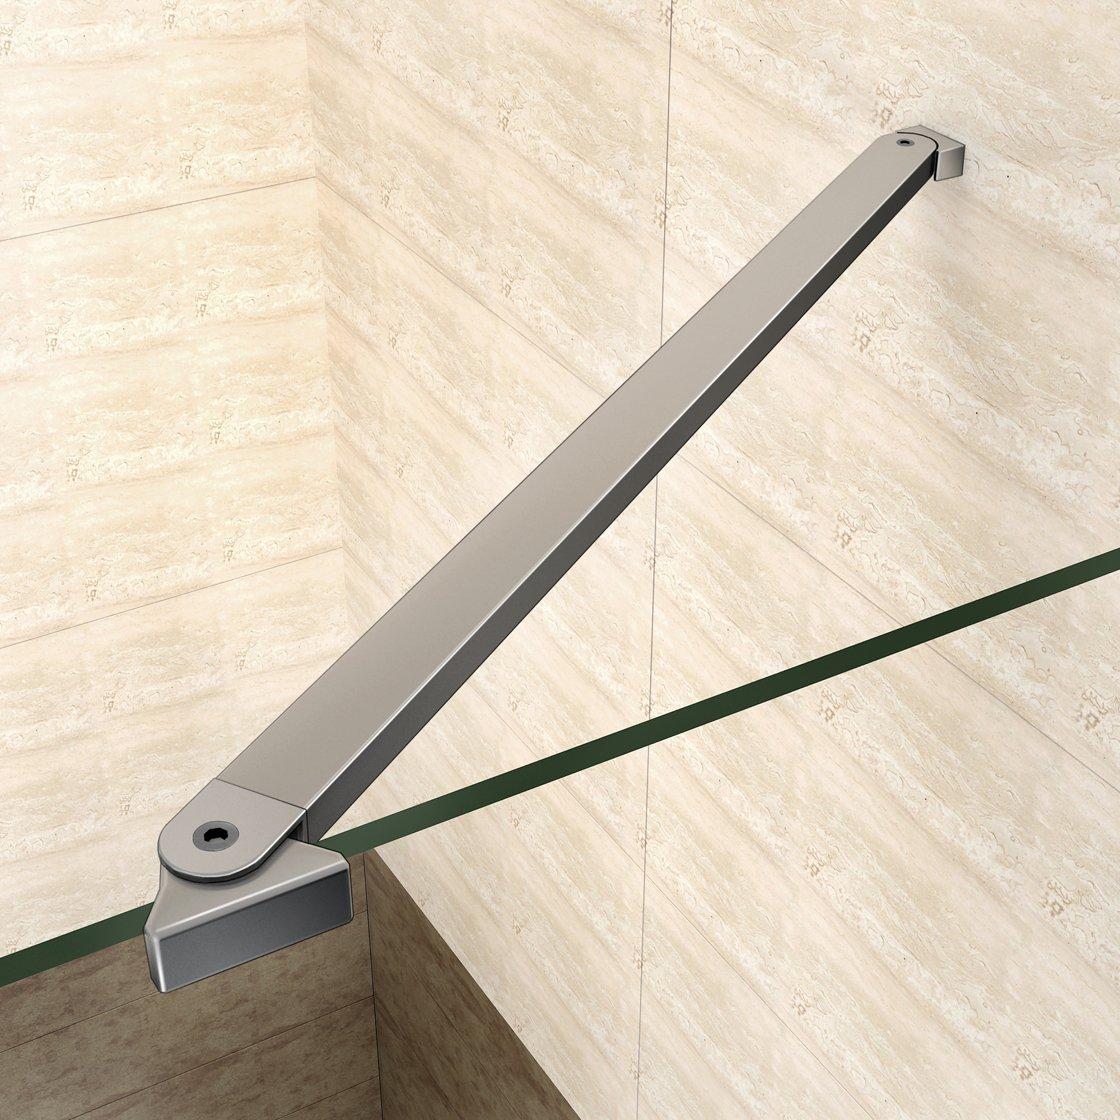 195 cm puerta Ducha nicchia baqueta Box ducha angular cristal ...